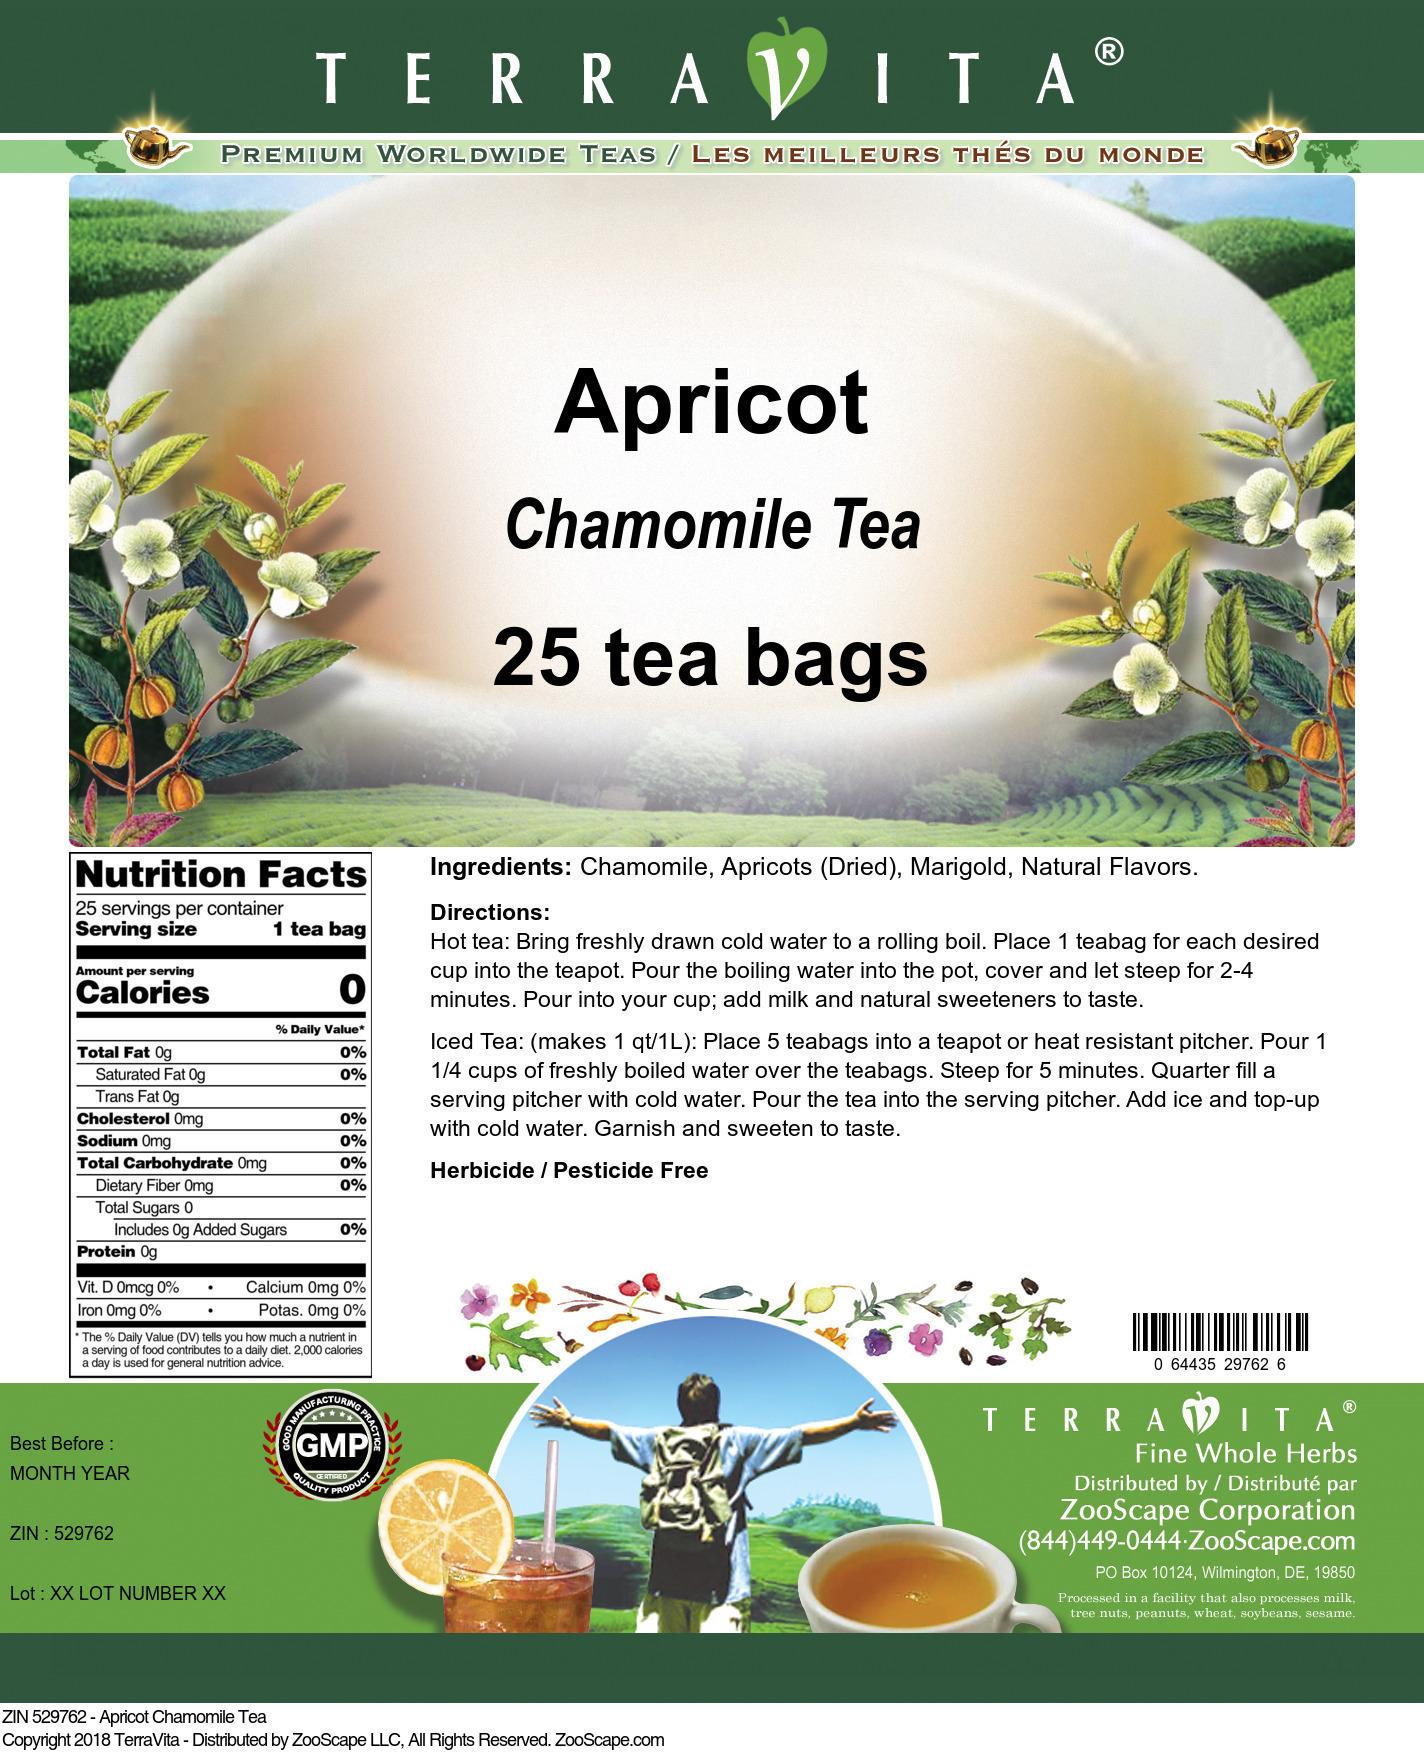 Apricot Chamomile Tea